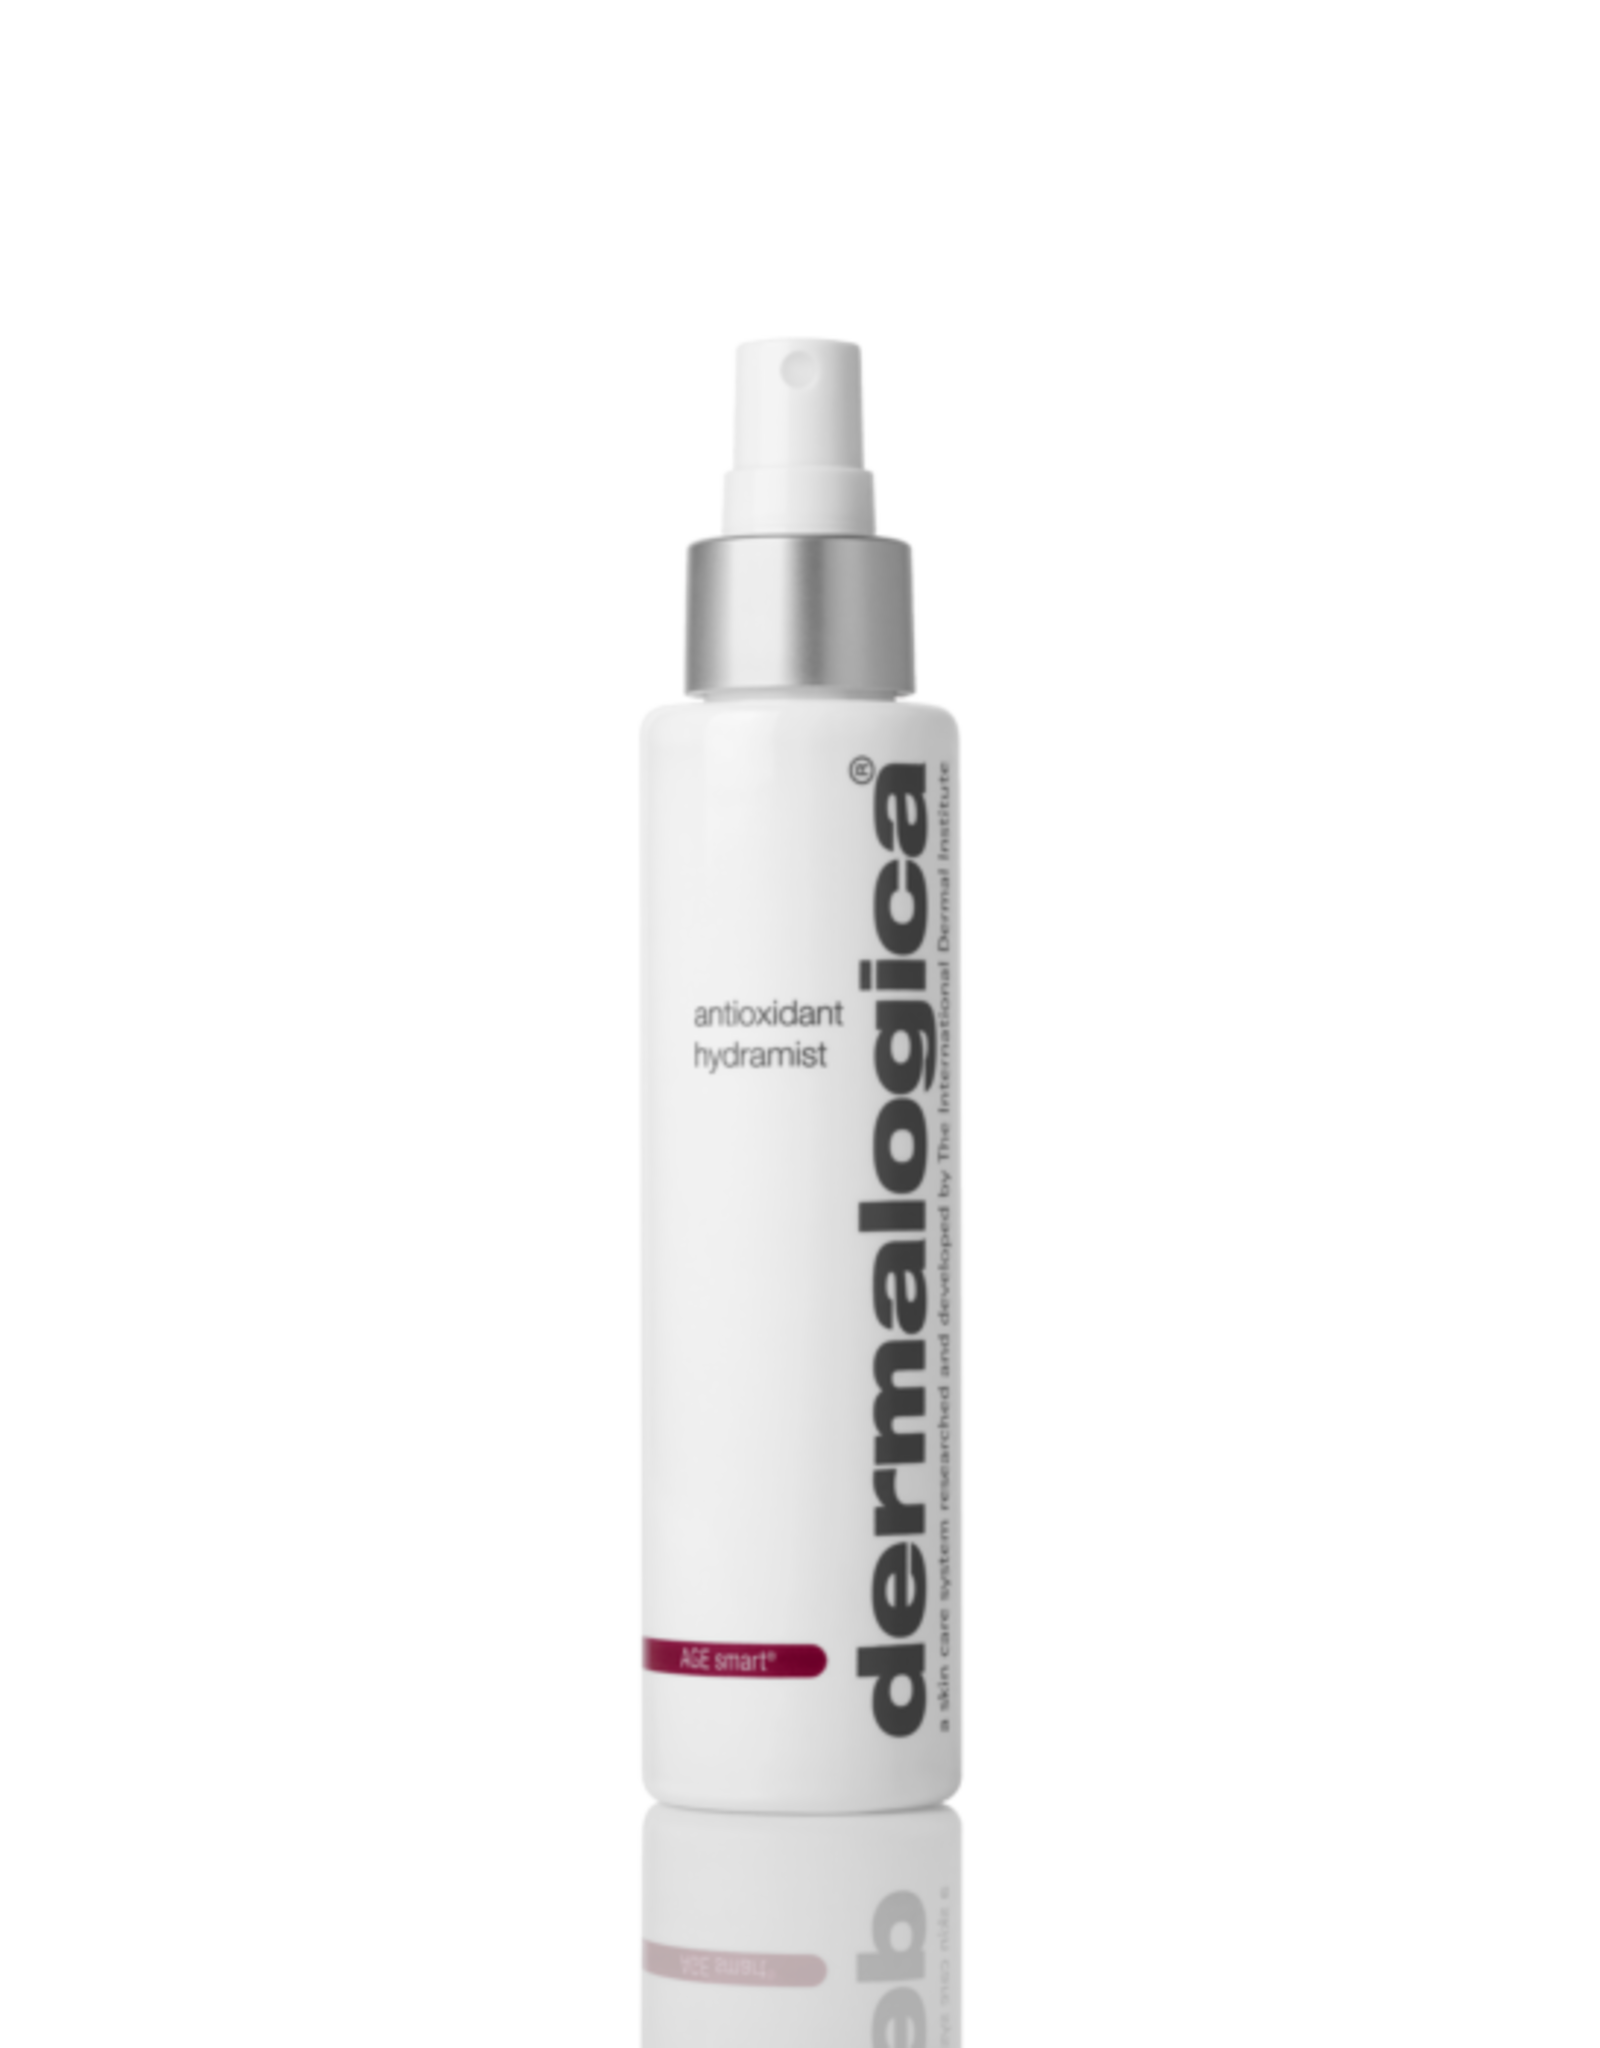 Dermalogica AGE Smart Antioxidant Hydramist 150ml - Dermalogica